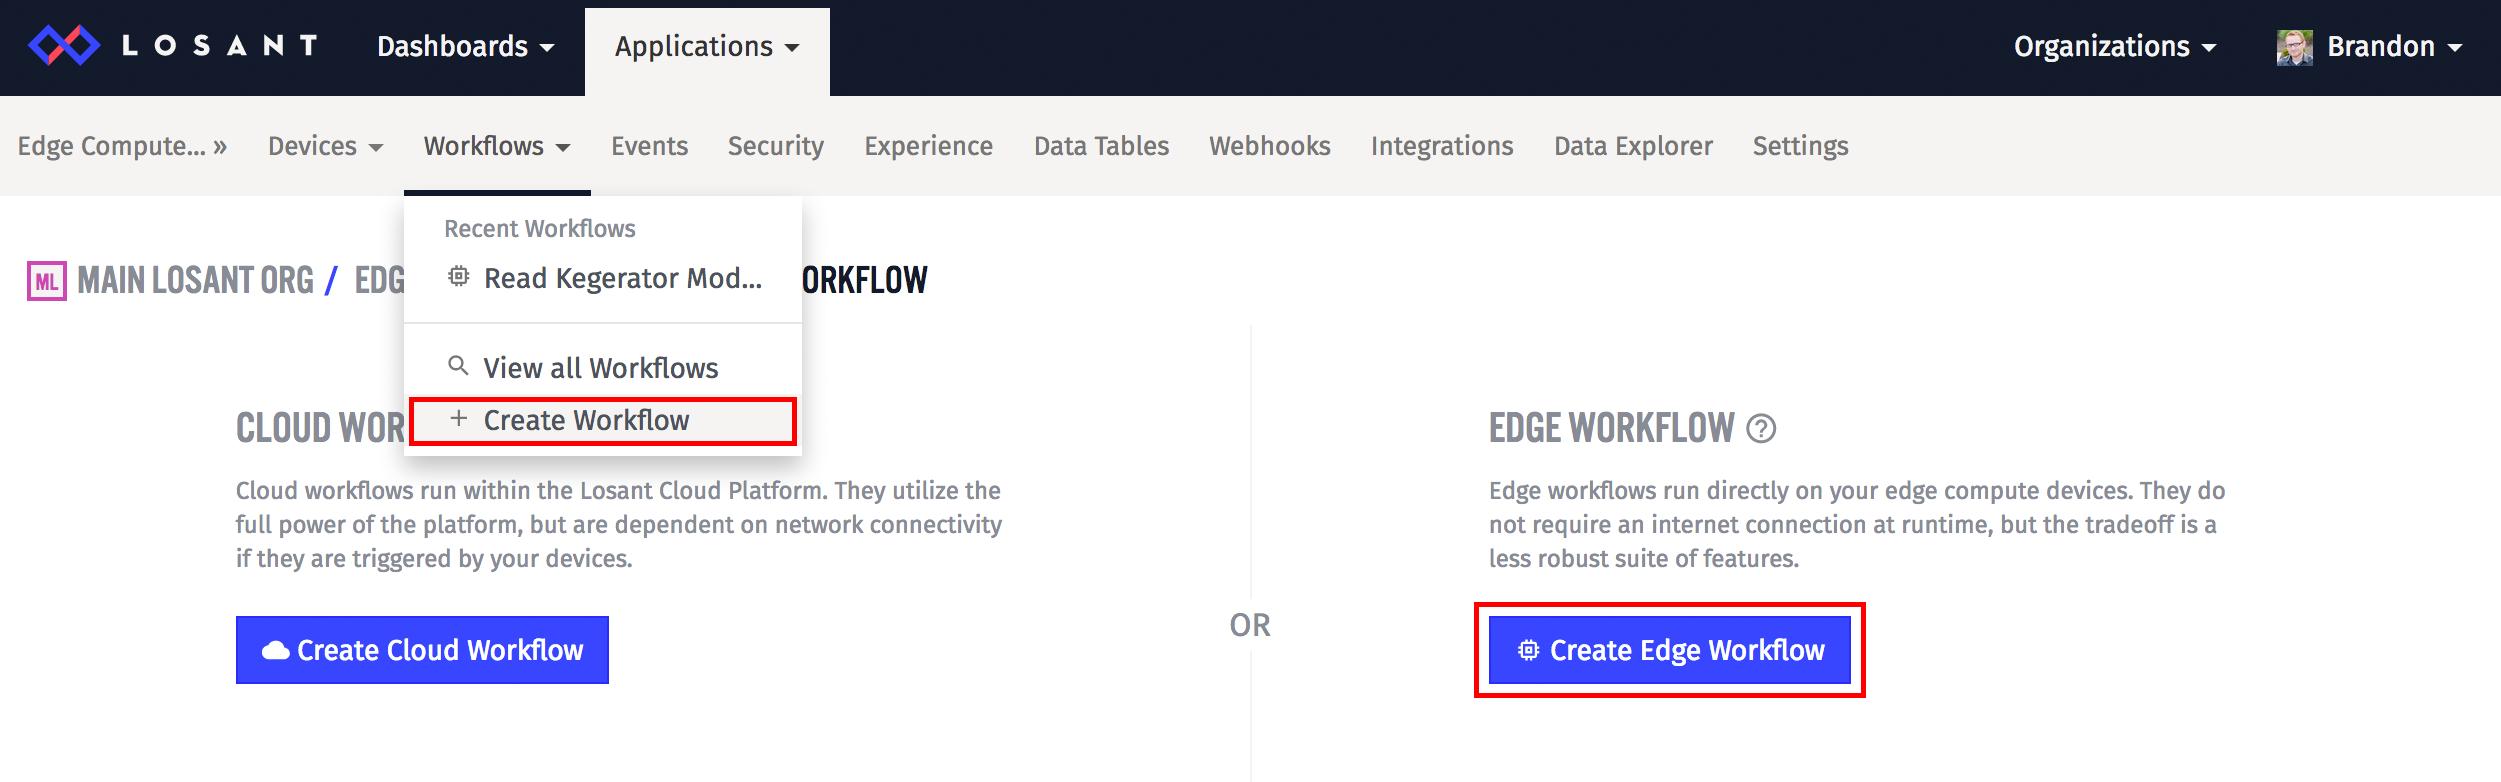 Create Edge Workflow